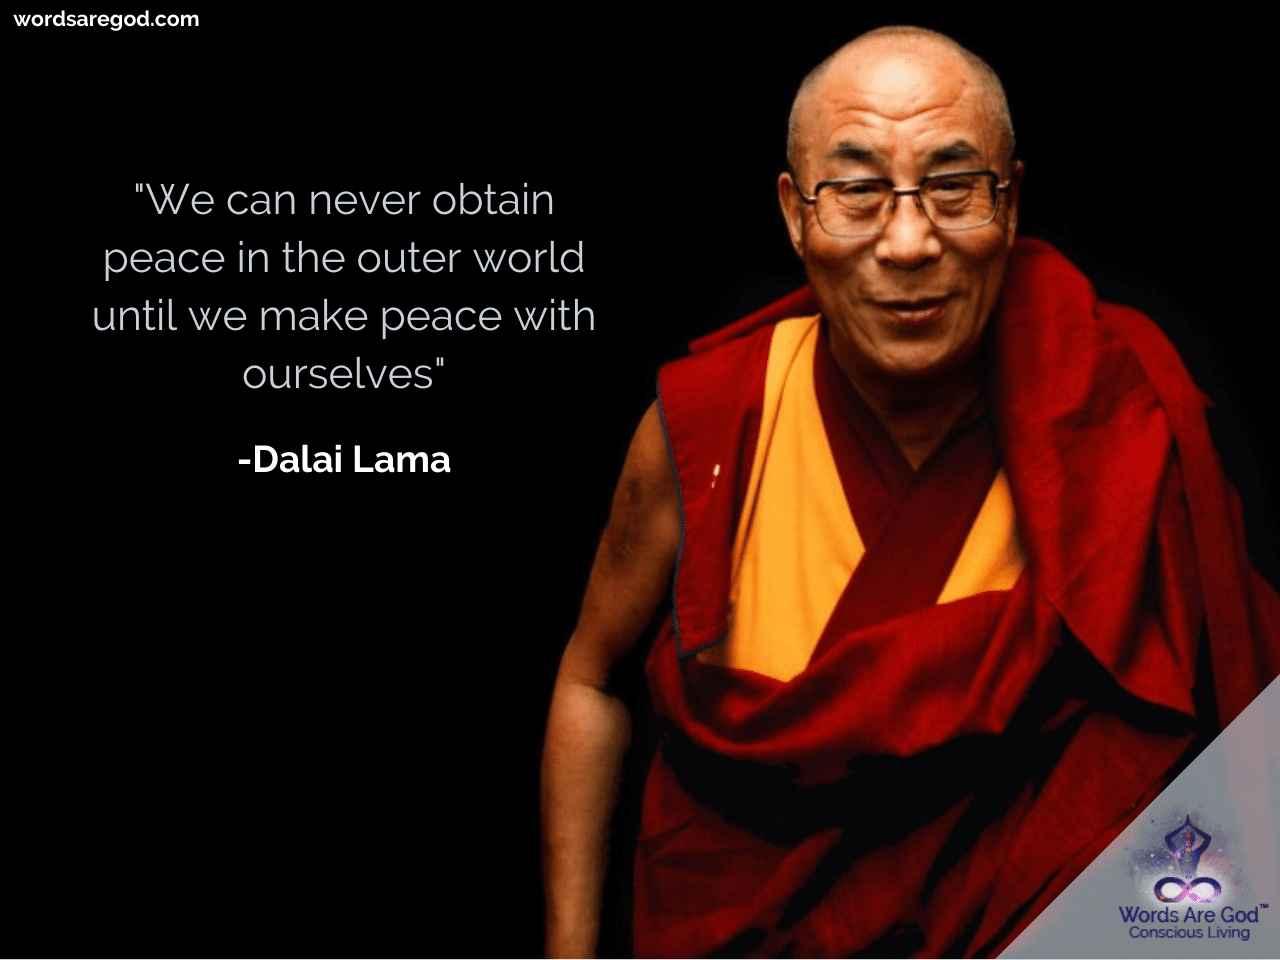 Dalai Lama Life Quote